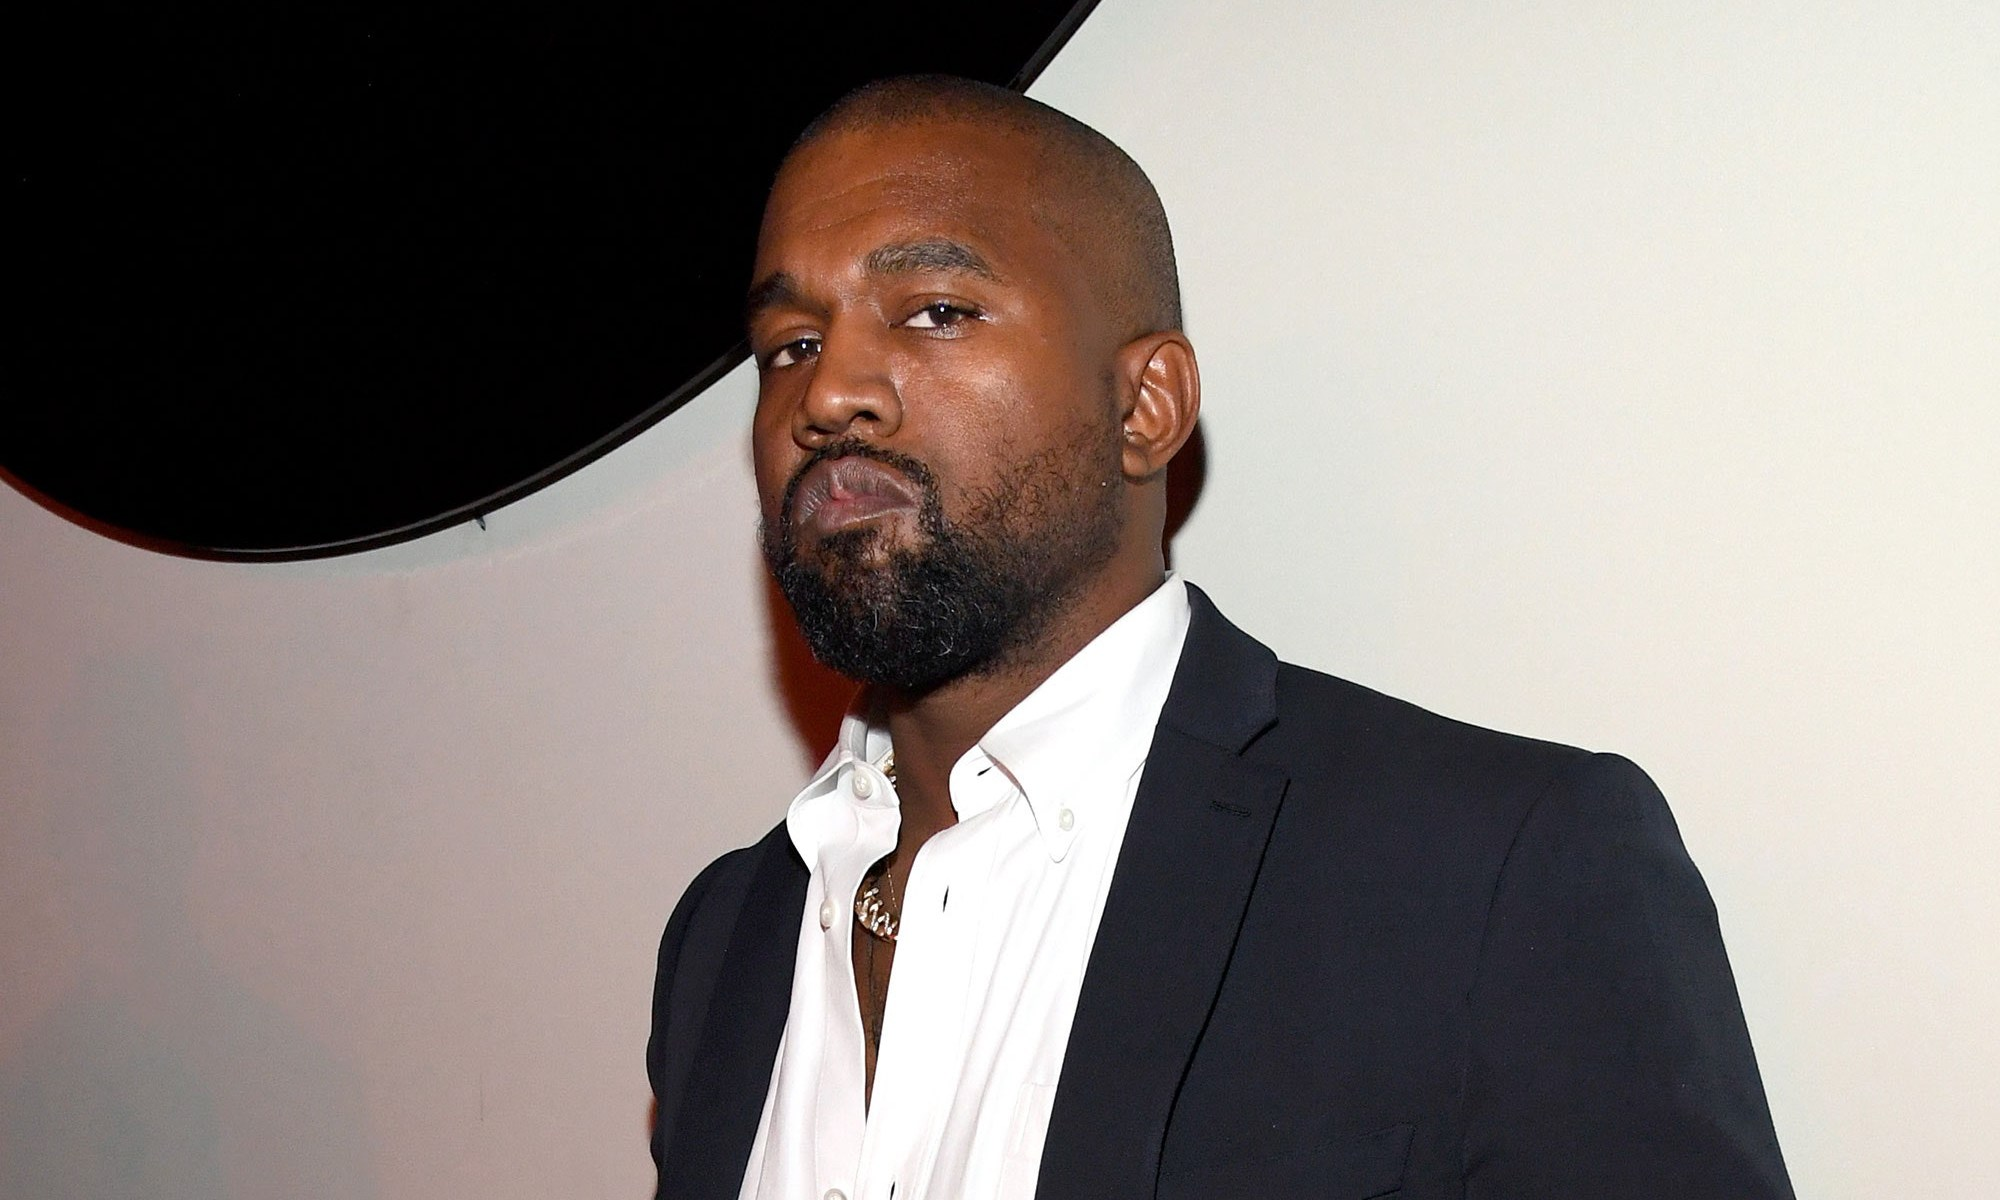 Kanye West 宣布将 50% 的版权返还 G.O.O.D Music 旗下艺人